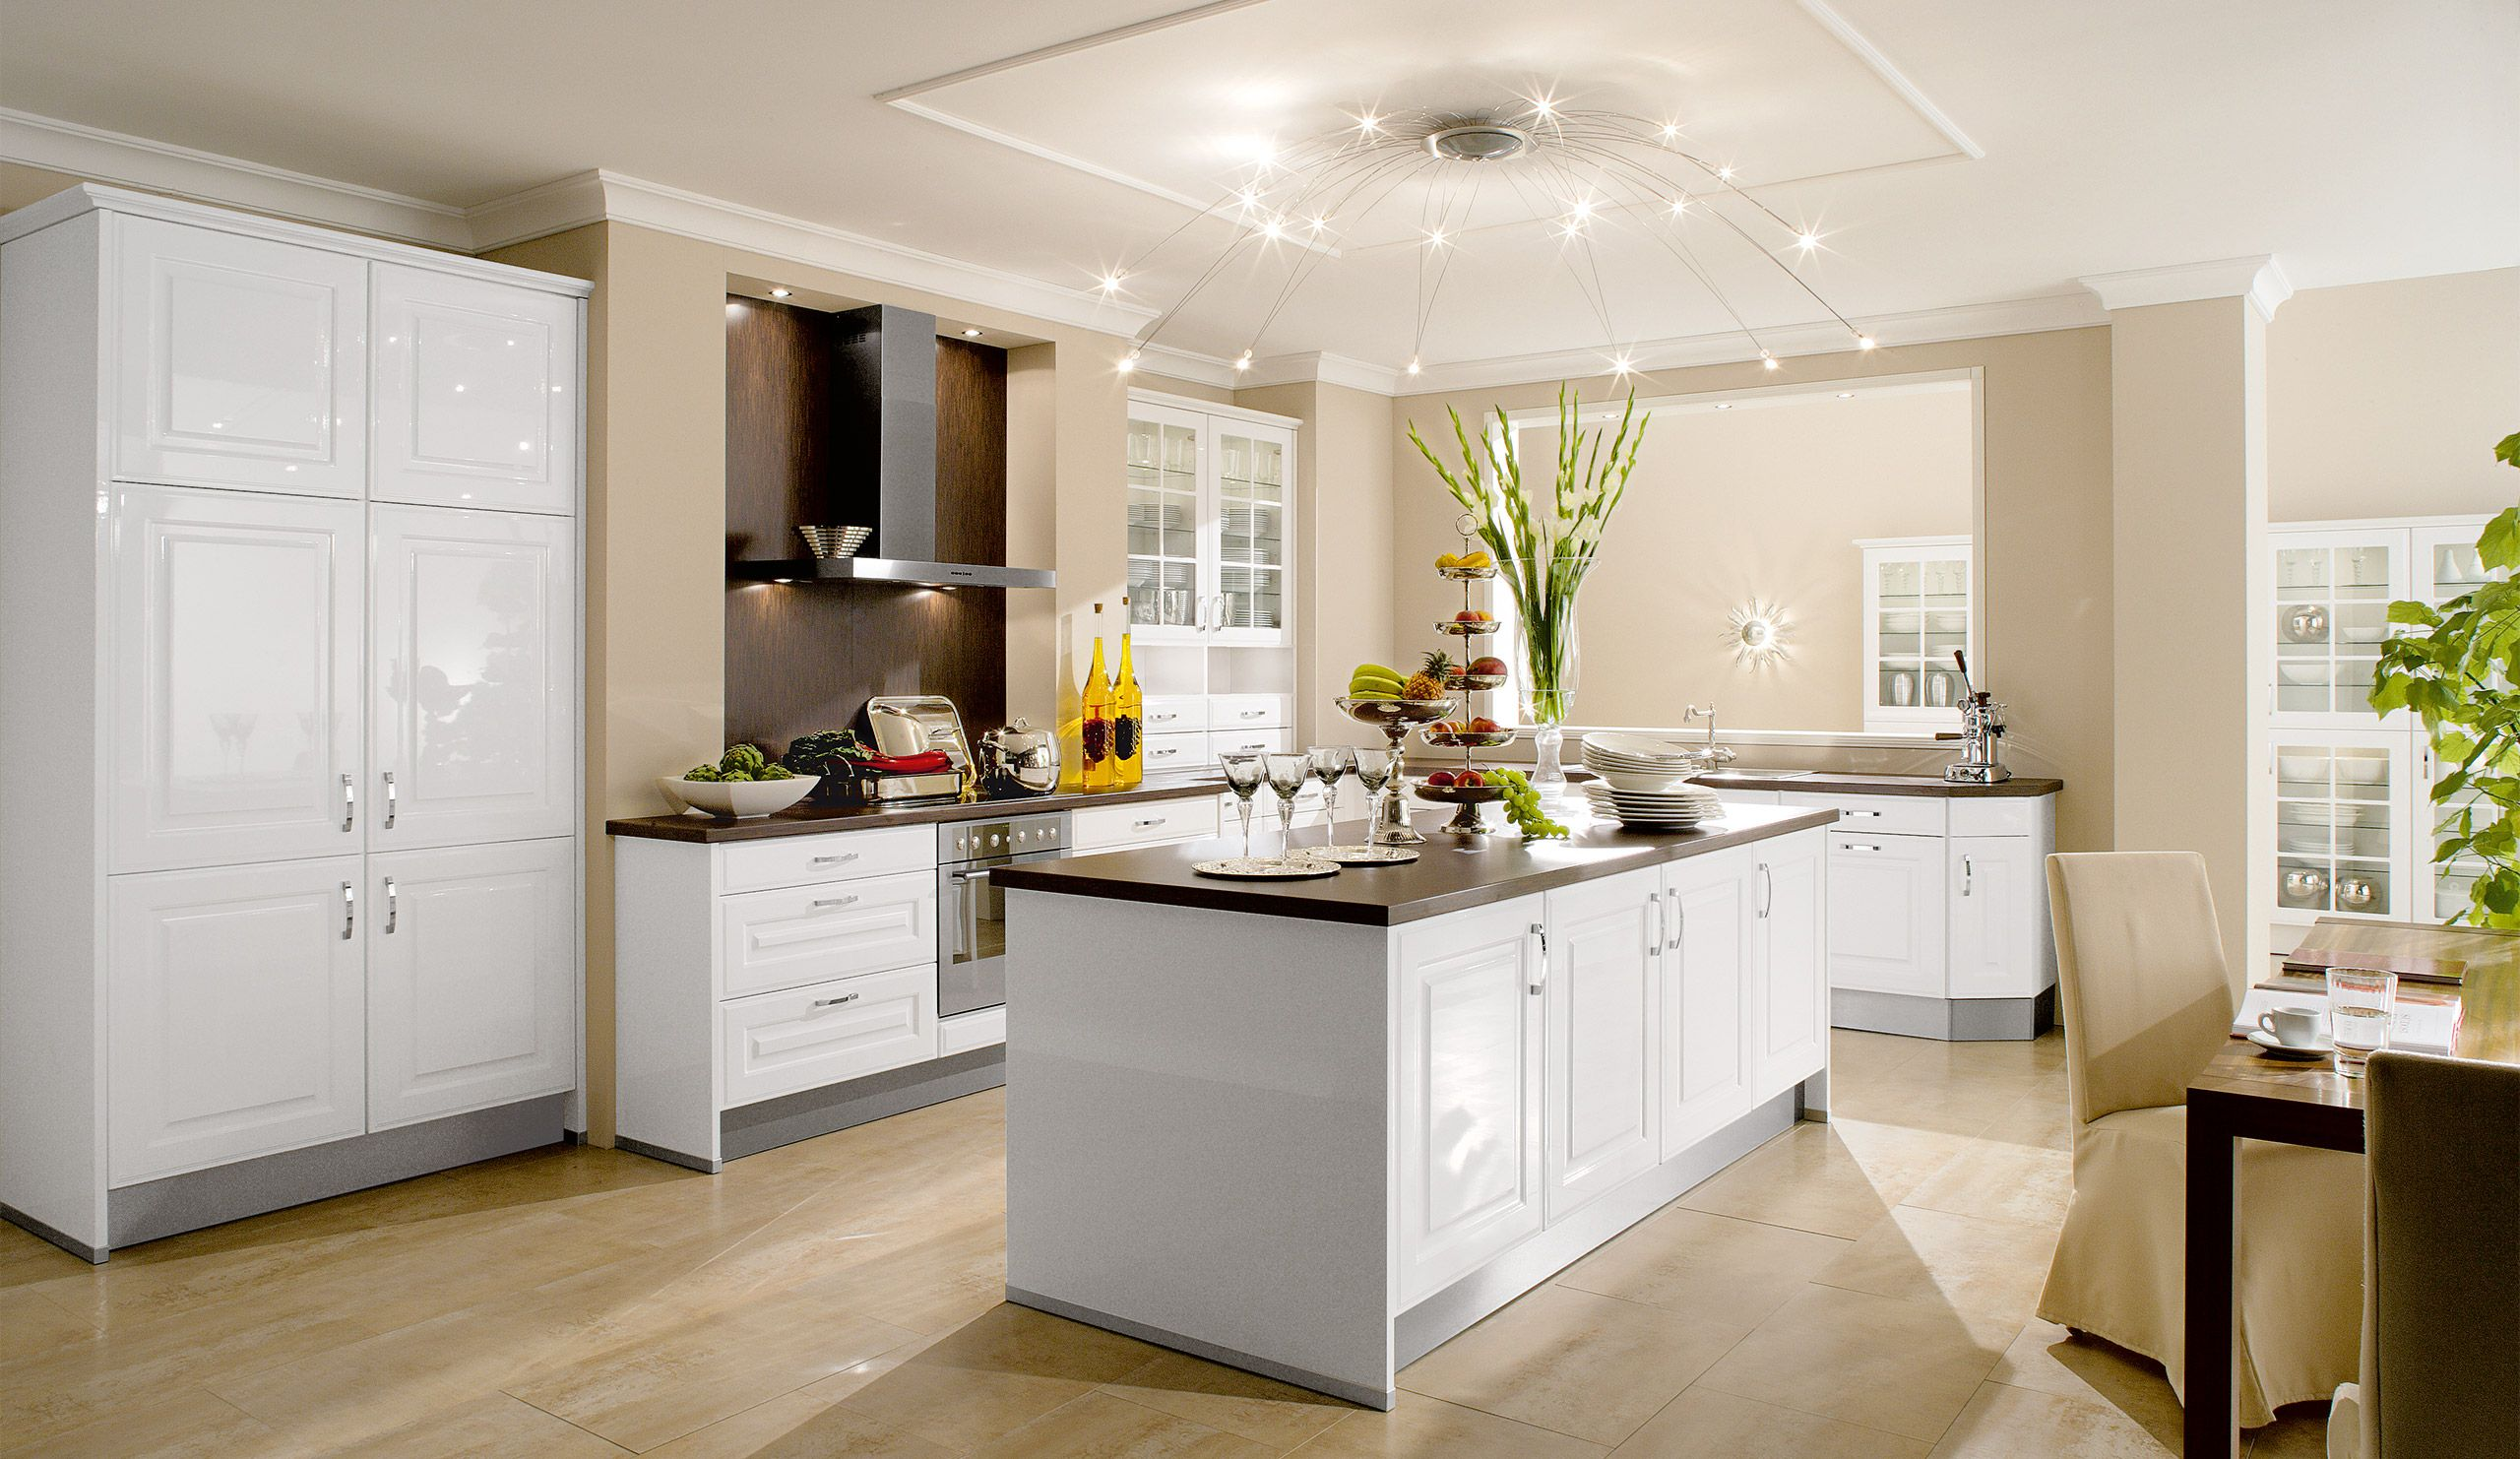 küche mit kochinsel Deko baum kies innen edelstahl weiss | Ideen ...